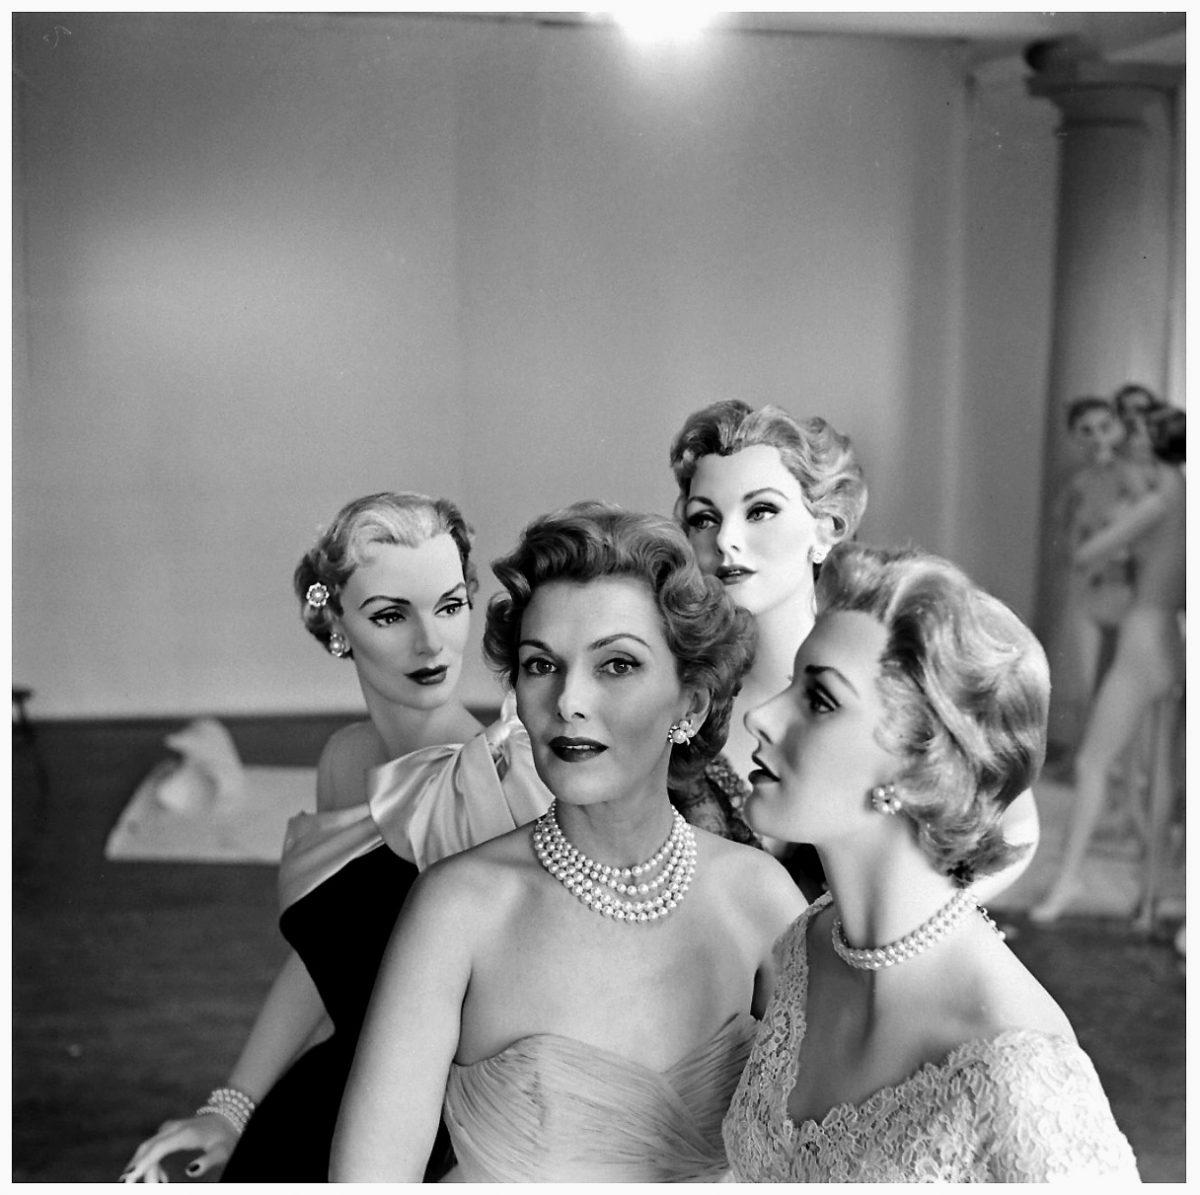 Anita Colby By Nina Leen 1954 1200x1195